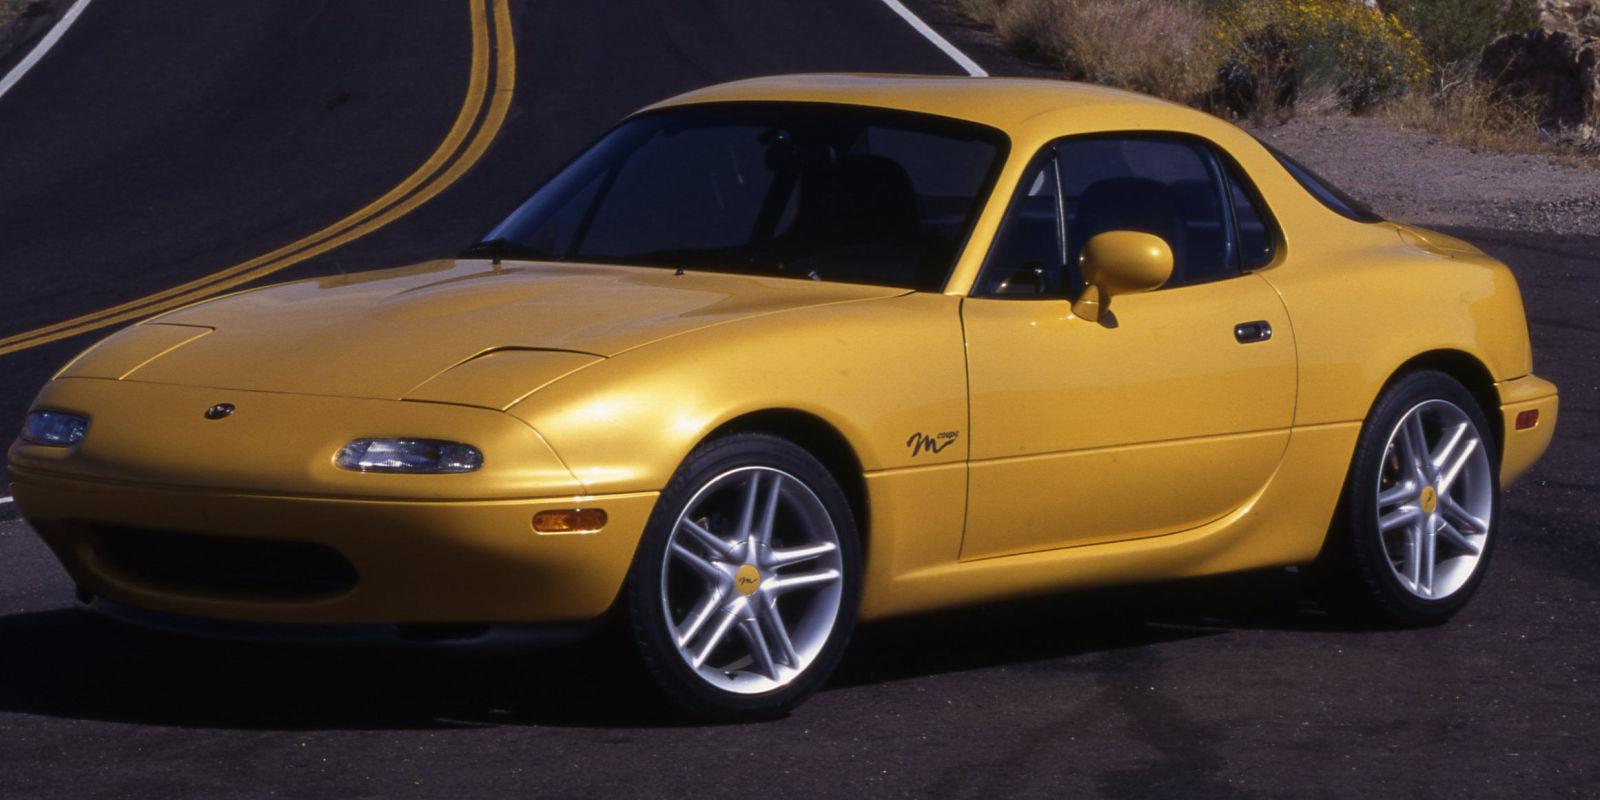 Drive Flashback: 1996 Mazda Miata M Coupe